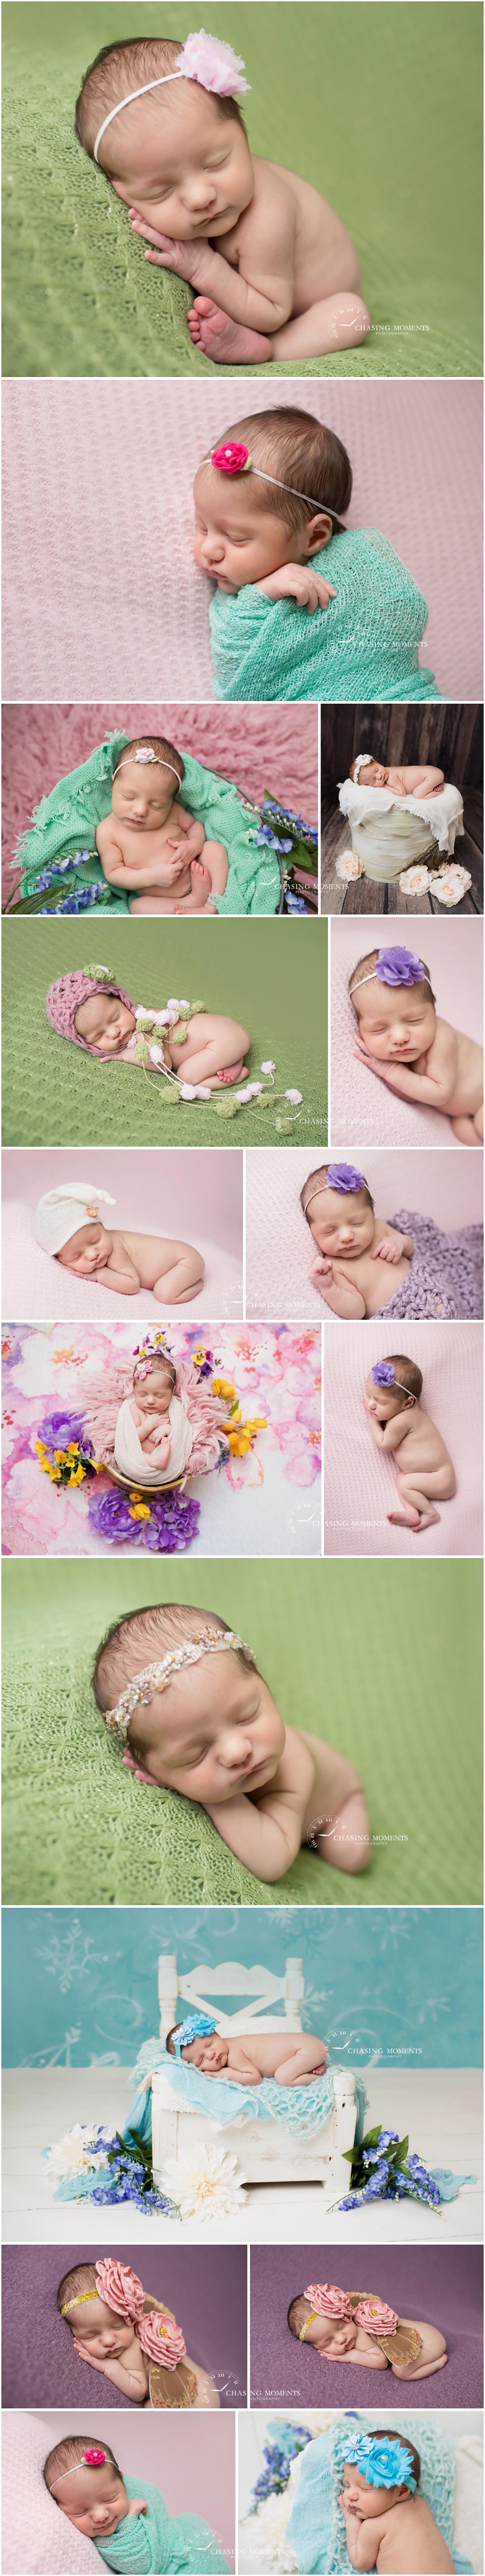 fairfax newborn photographer